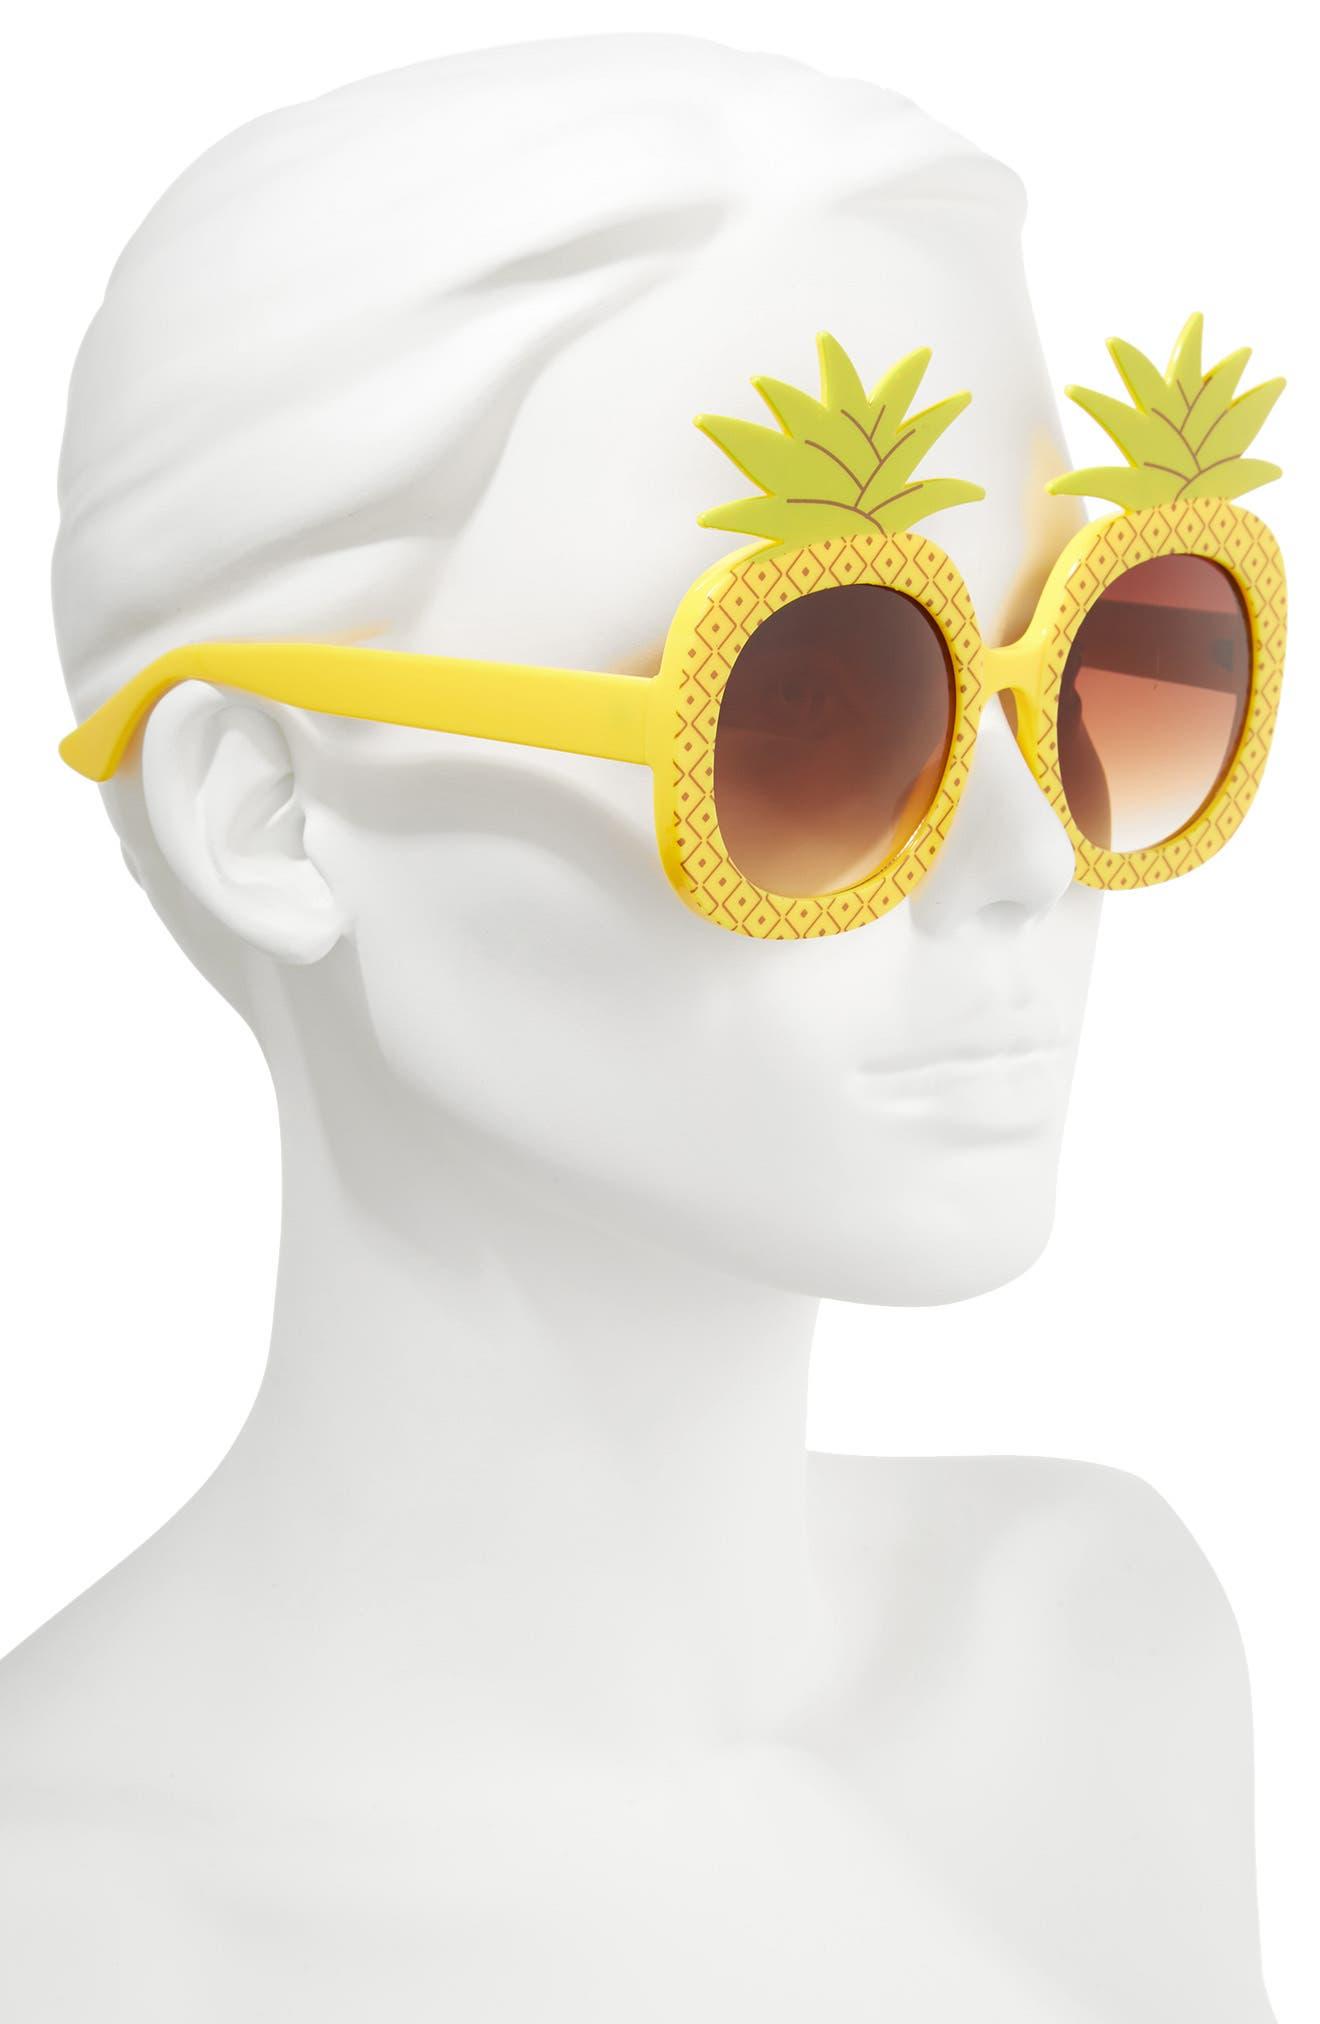 51mm Pineapple Glam Sunglasses,                             Alternate thumbnail 2, color,